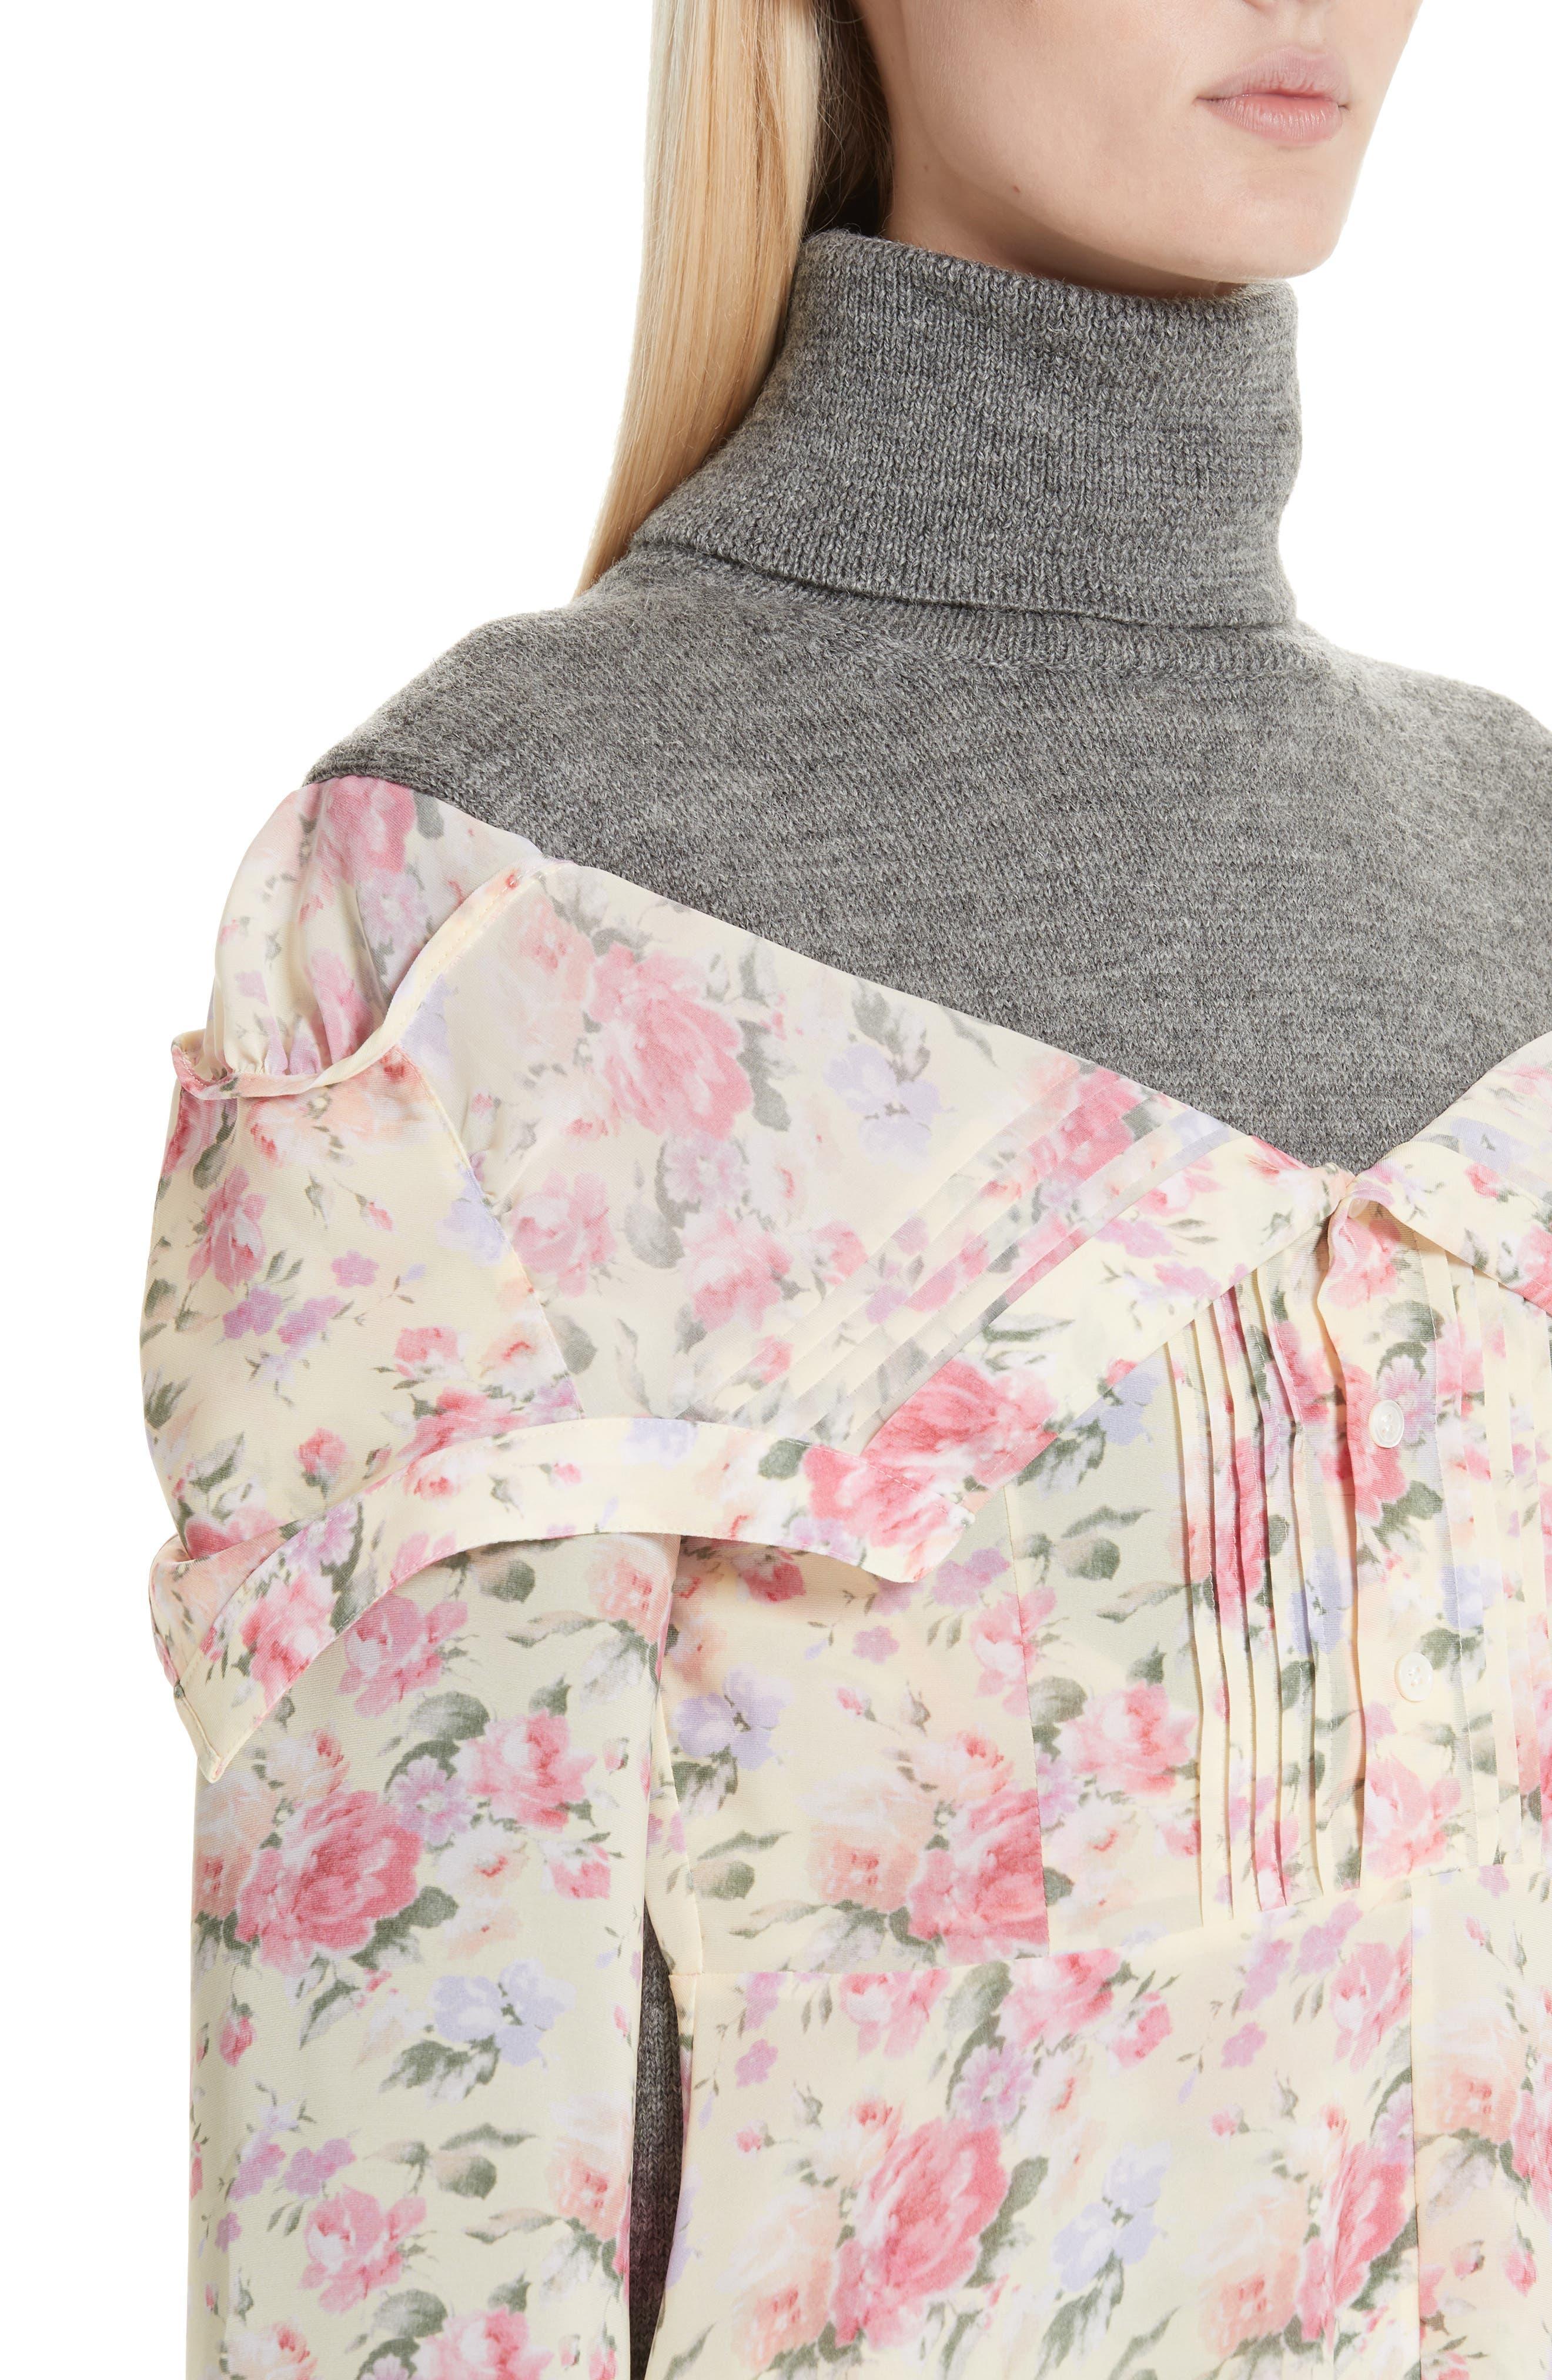 Mixed Media Floral Turtleneck Dress,                             Alternate thumbnail 4, color,                             YELLOW/ PINK/ PPL/ GREY